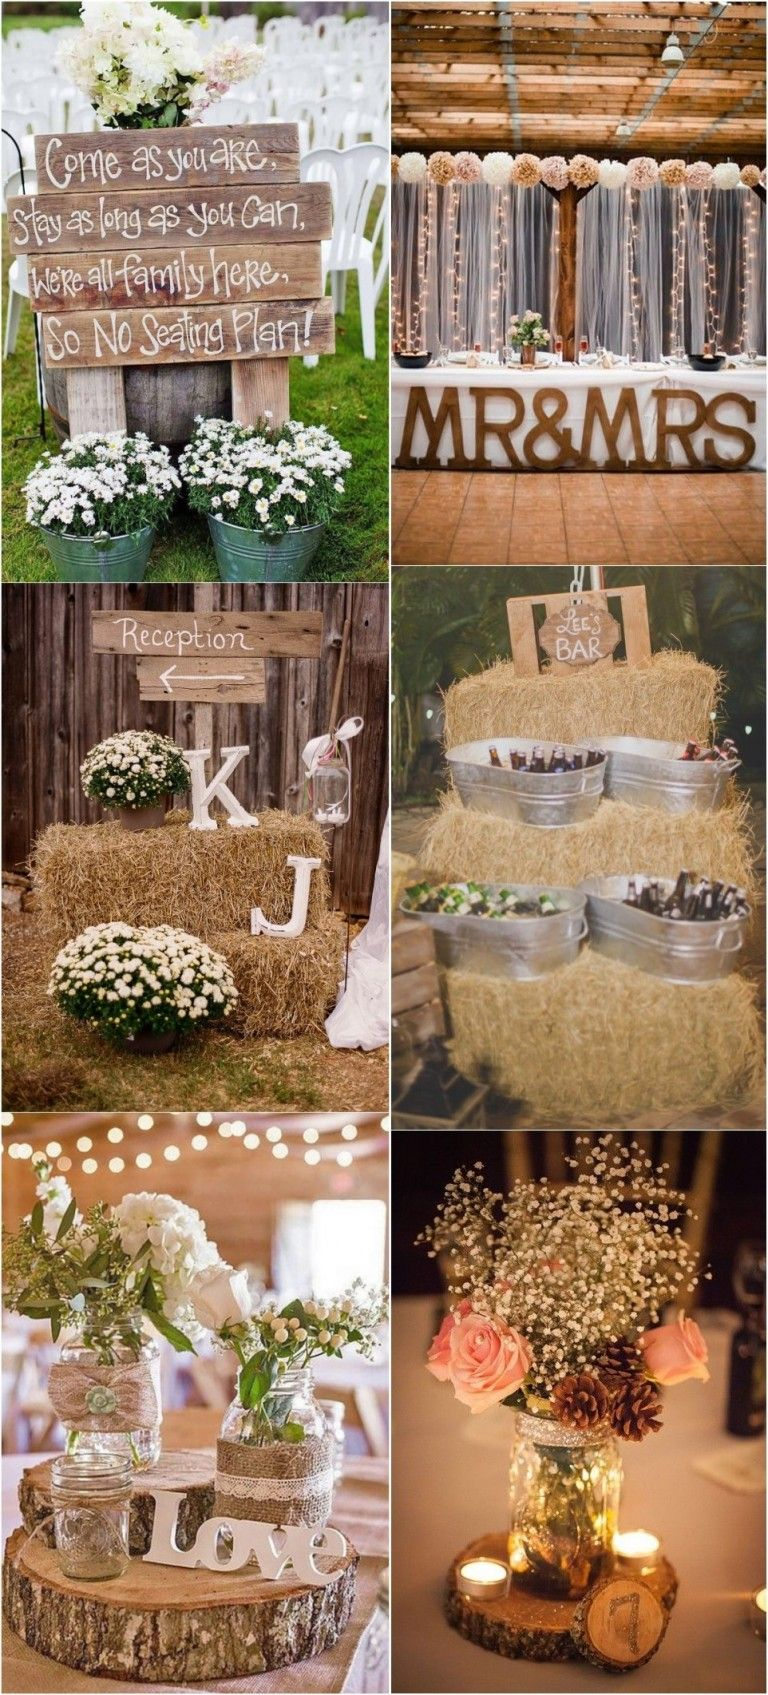 Wedding room decoration ideas 2018   Rustic Country Wedding Ideas to Shine in   Wedding